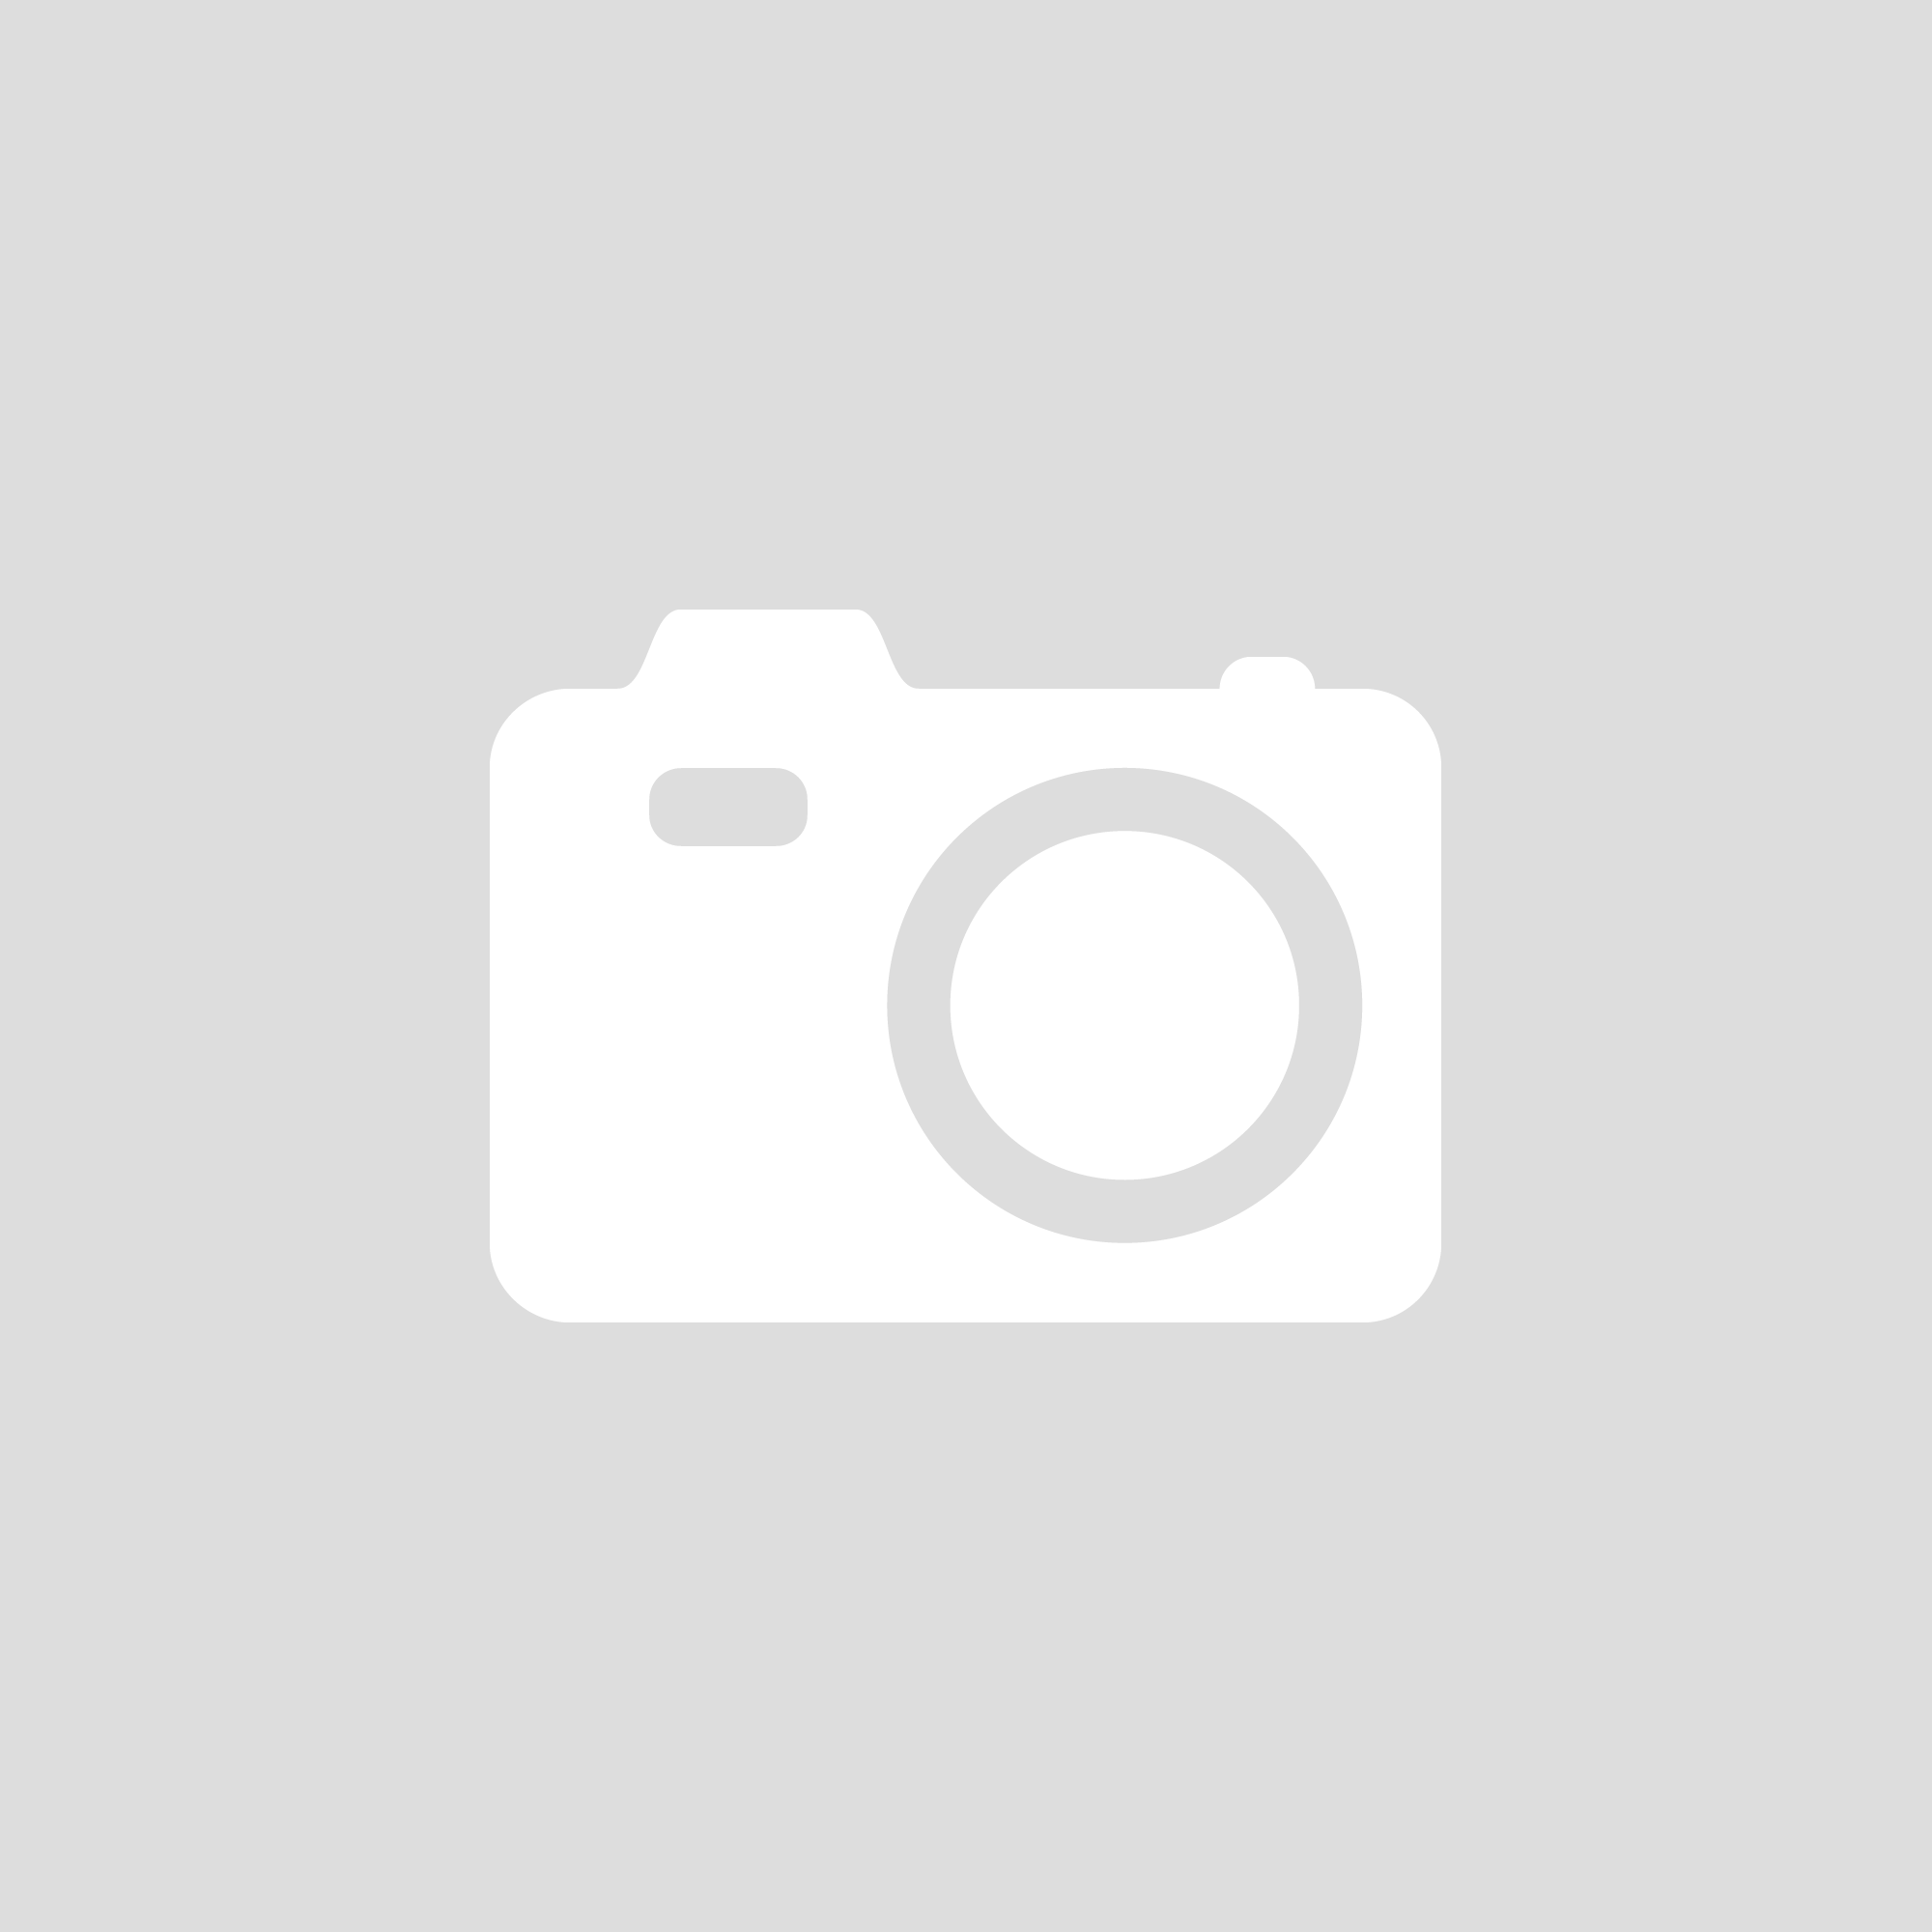 Monaco Black Diamond Cushion by Thomas Frederick HR11013